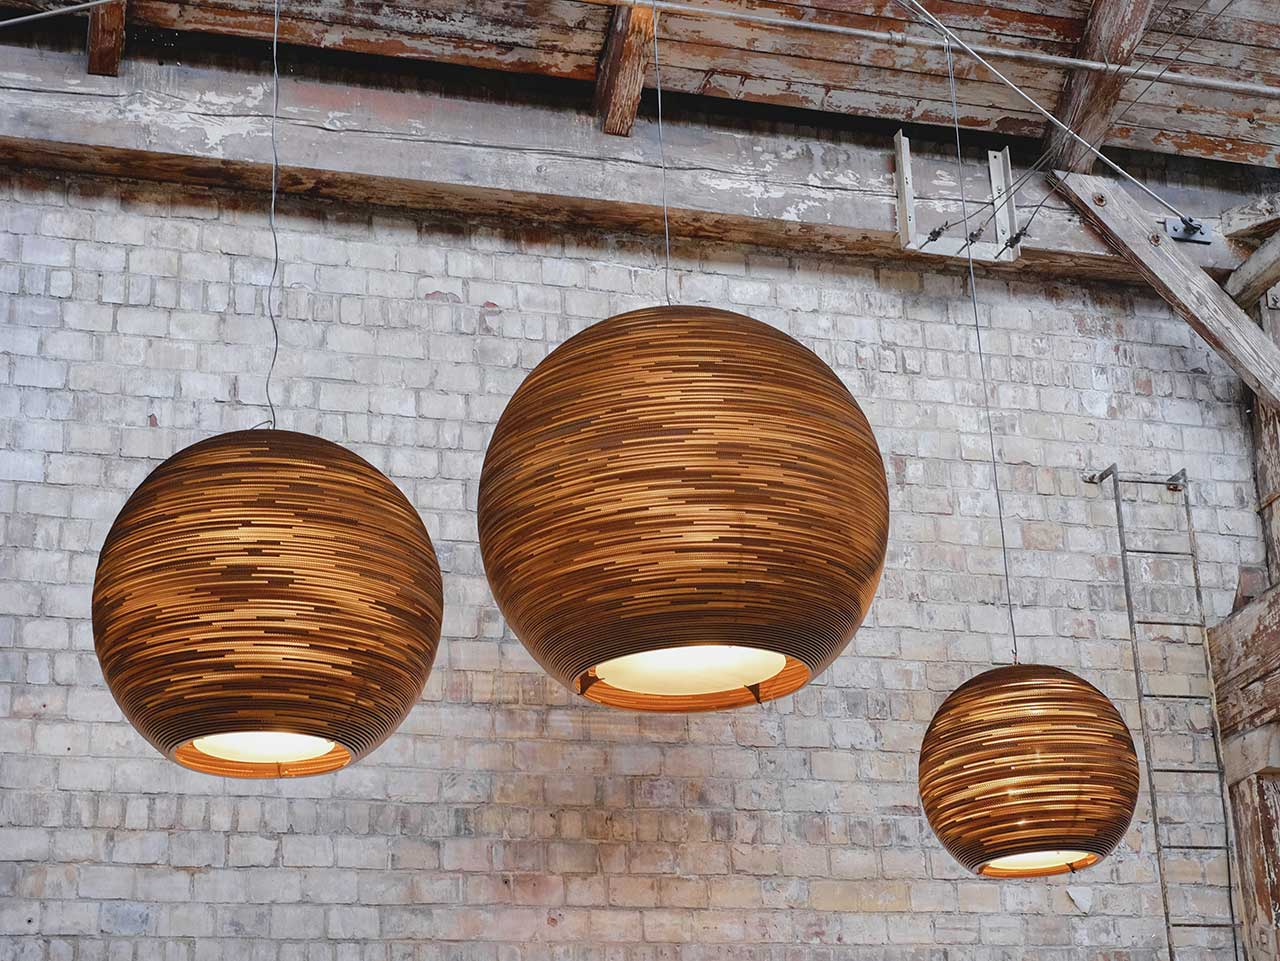 Graypants' Scraplights Transforms Cardboard into Elegant Lighting